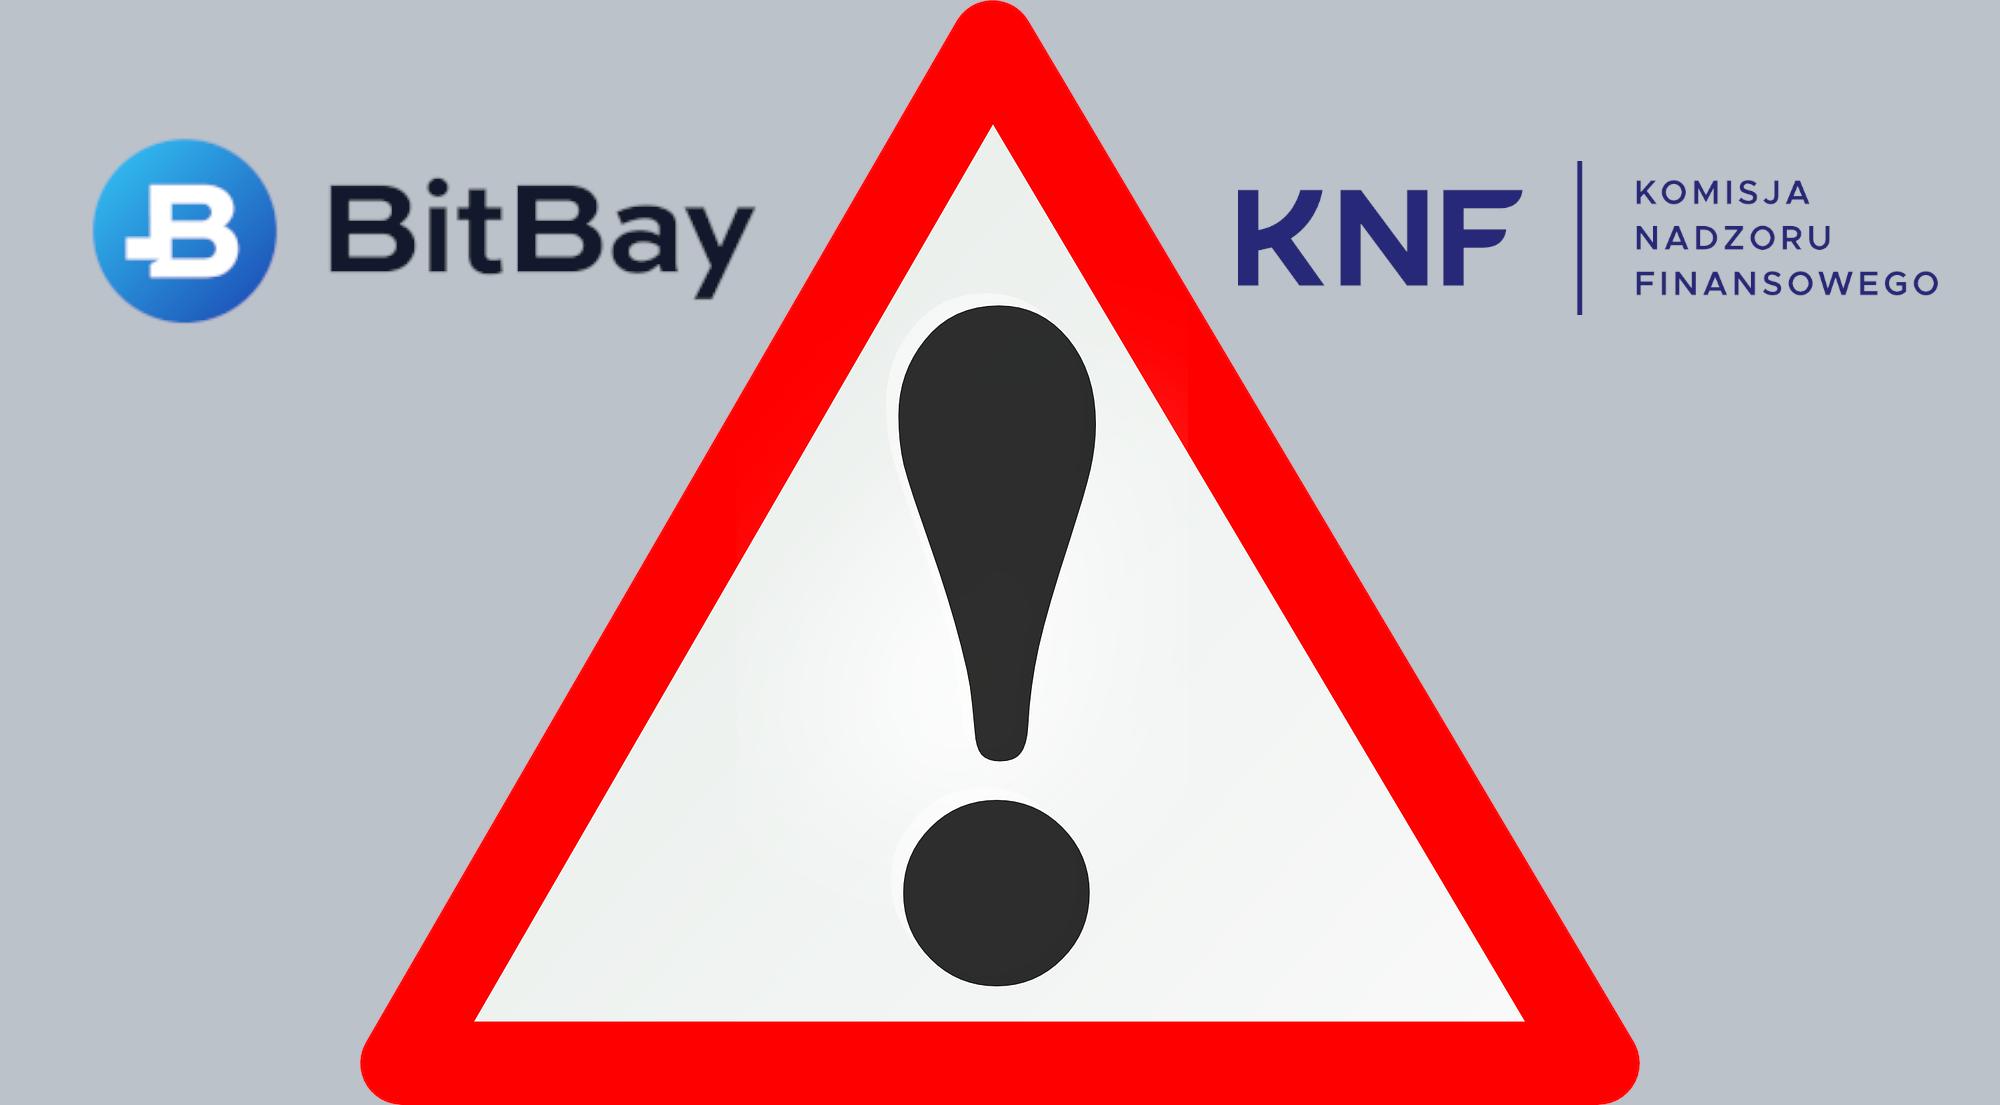 bitbay knf